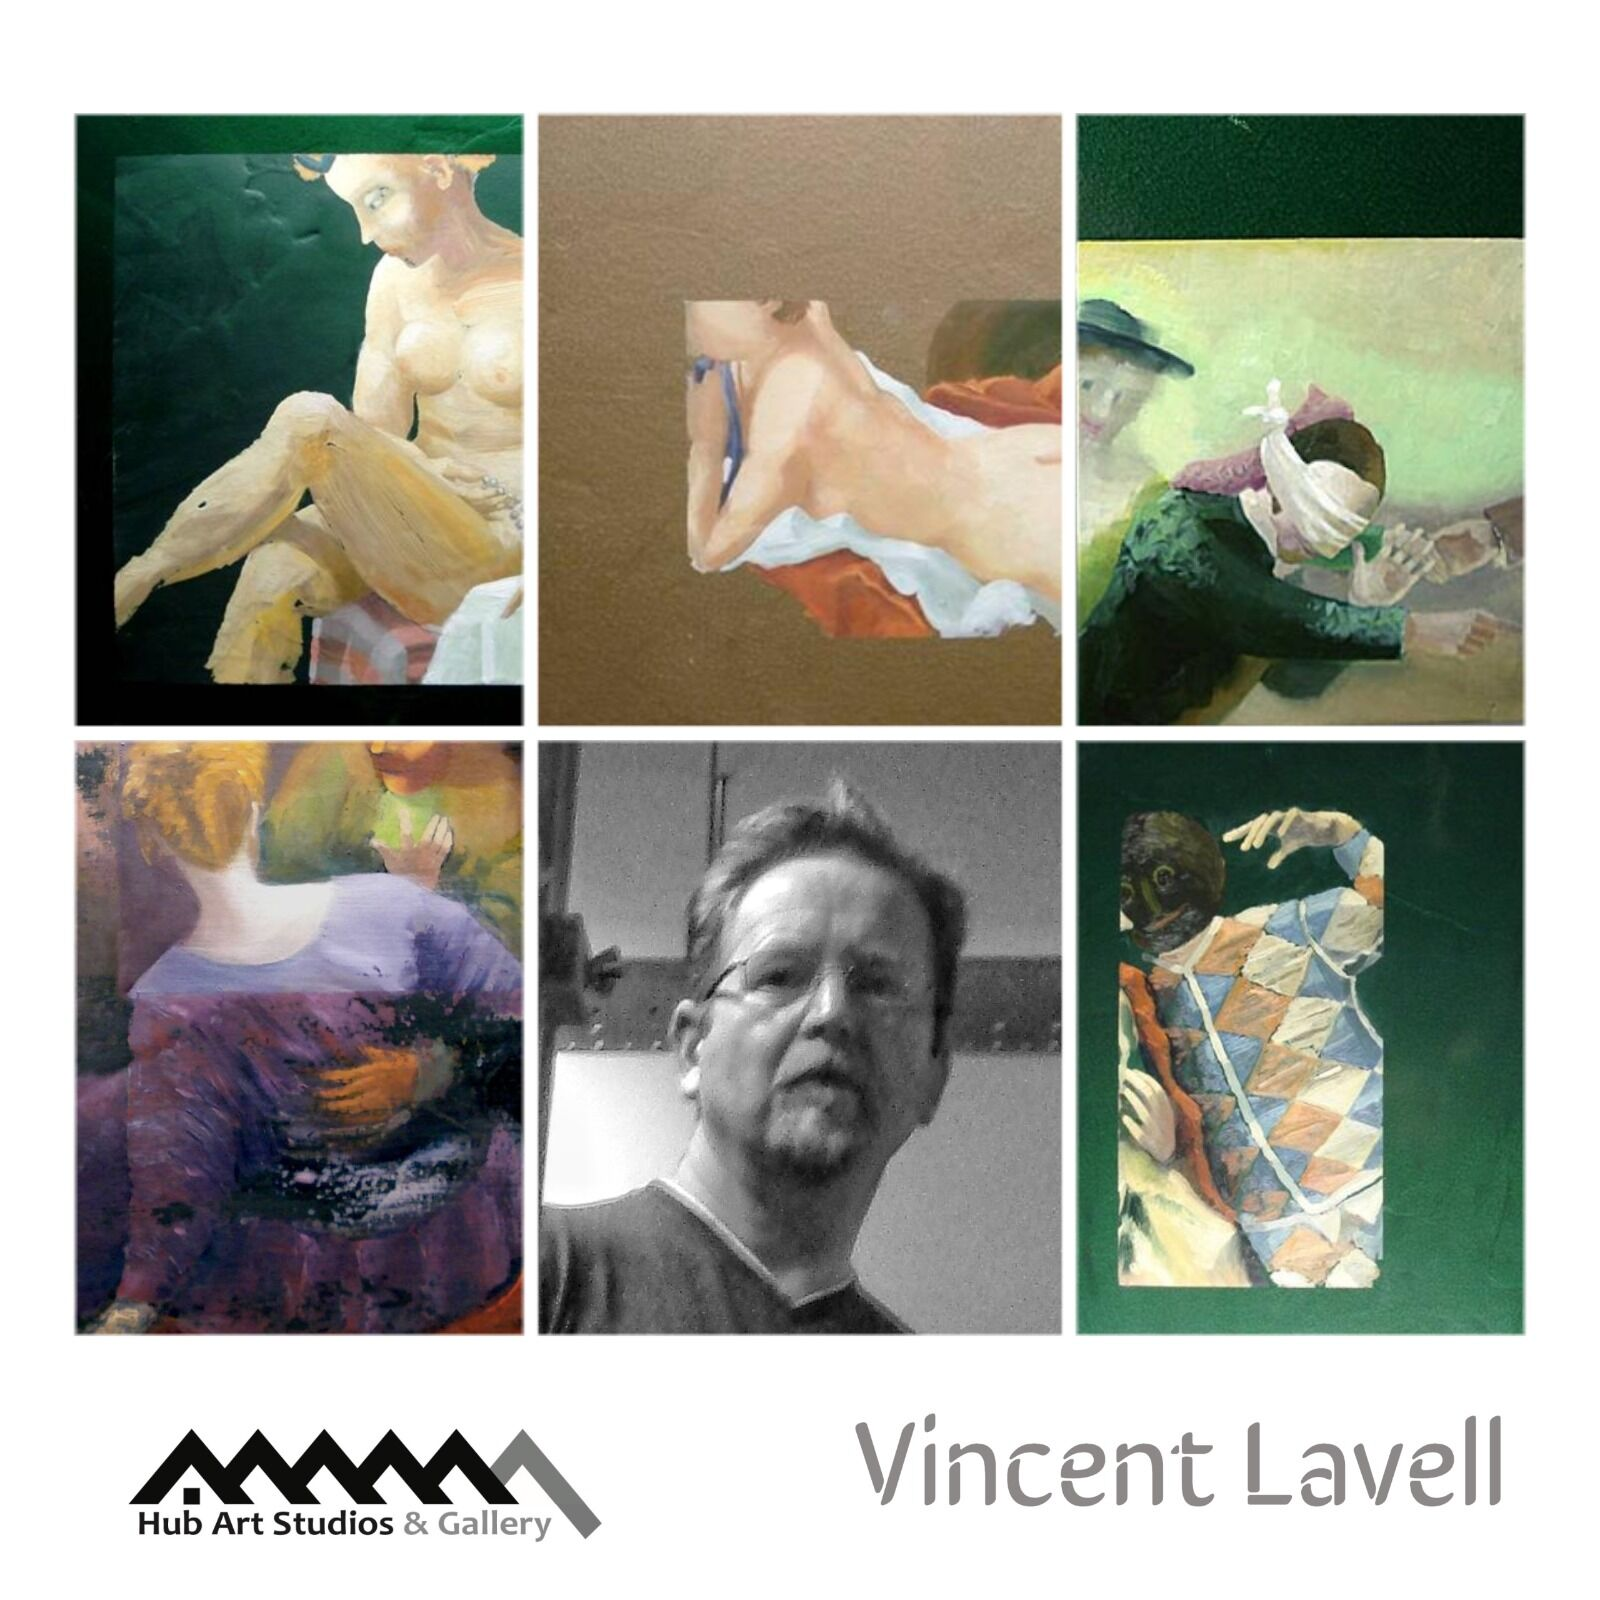 Vincent Lavell